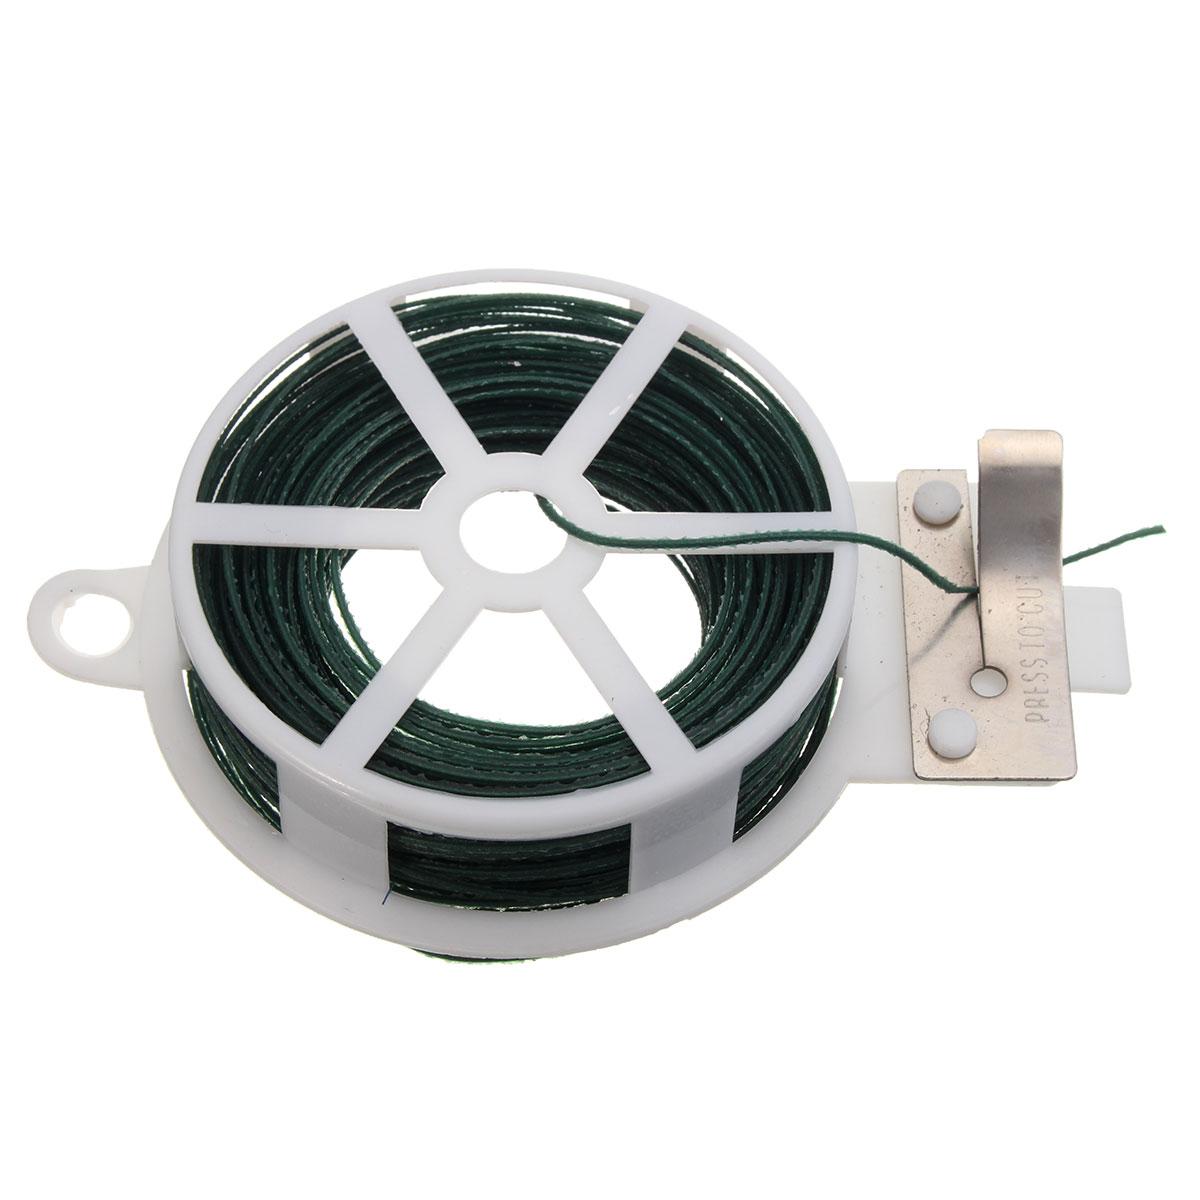 ∞Newest Cable Tie 30M Roll Wire Twist Tie Reel Green Garden ...